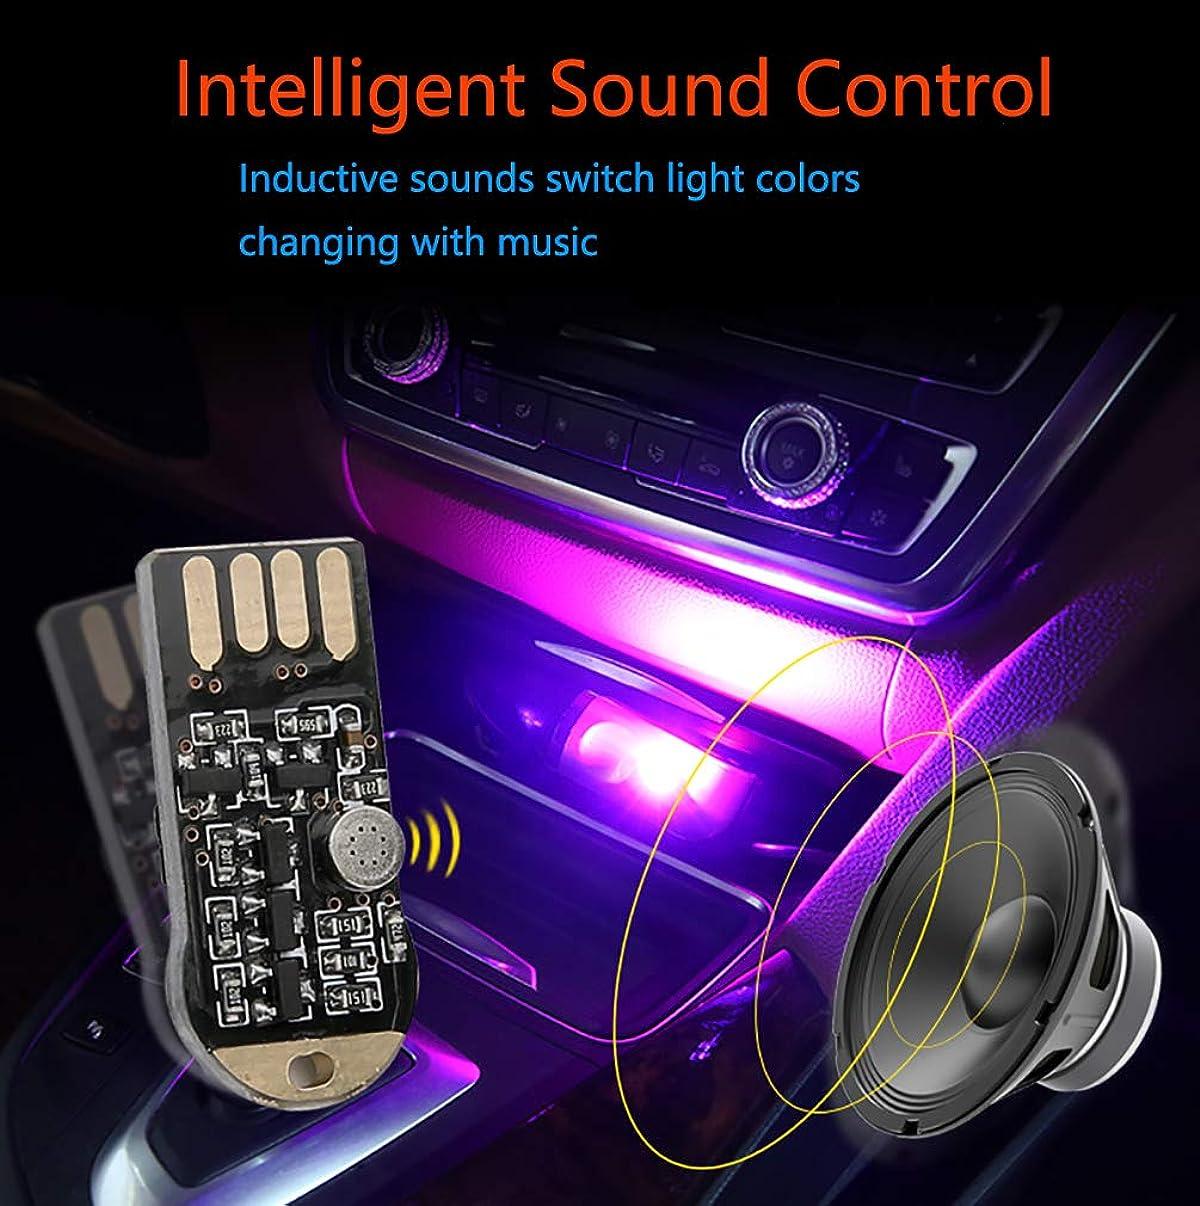 2 Pack-Portable USB Car Intelligent Sound Control Interior Atmosphere Lamp Night Light LED Decoration Light-for Automotive Decorative Lighting Atmosphere Bar Club Party DJ Karaoke Wedding Show